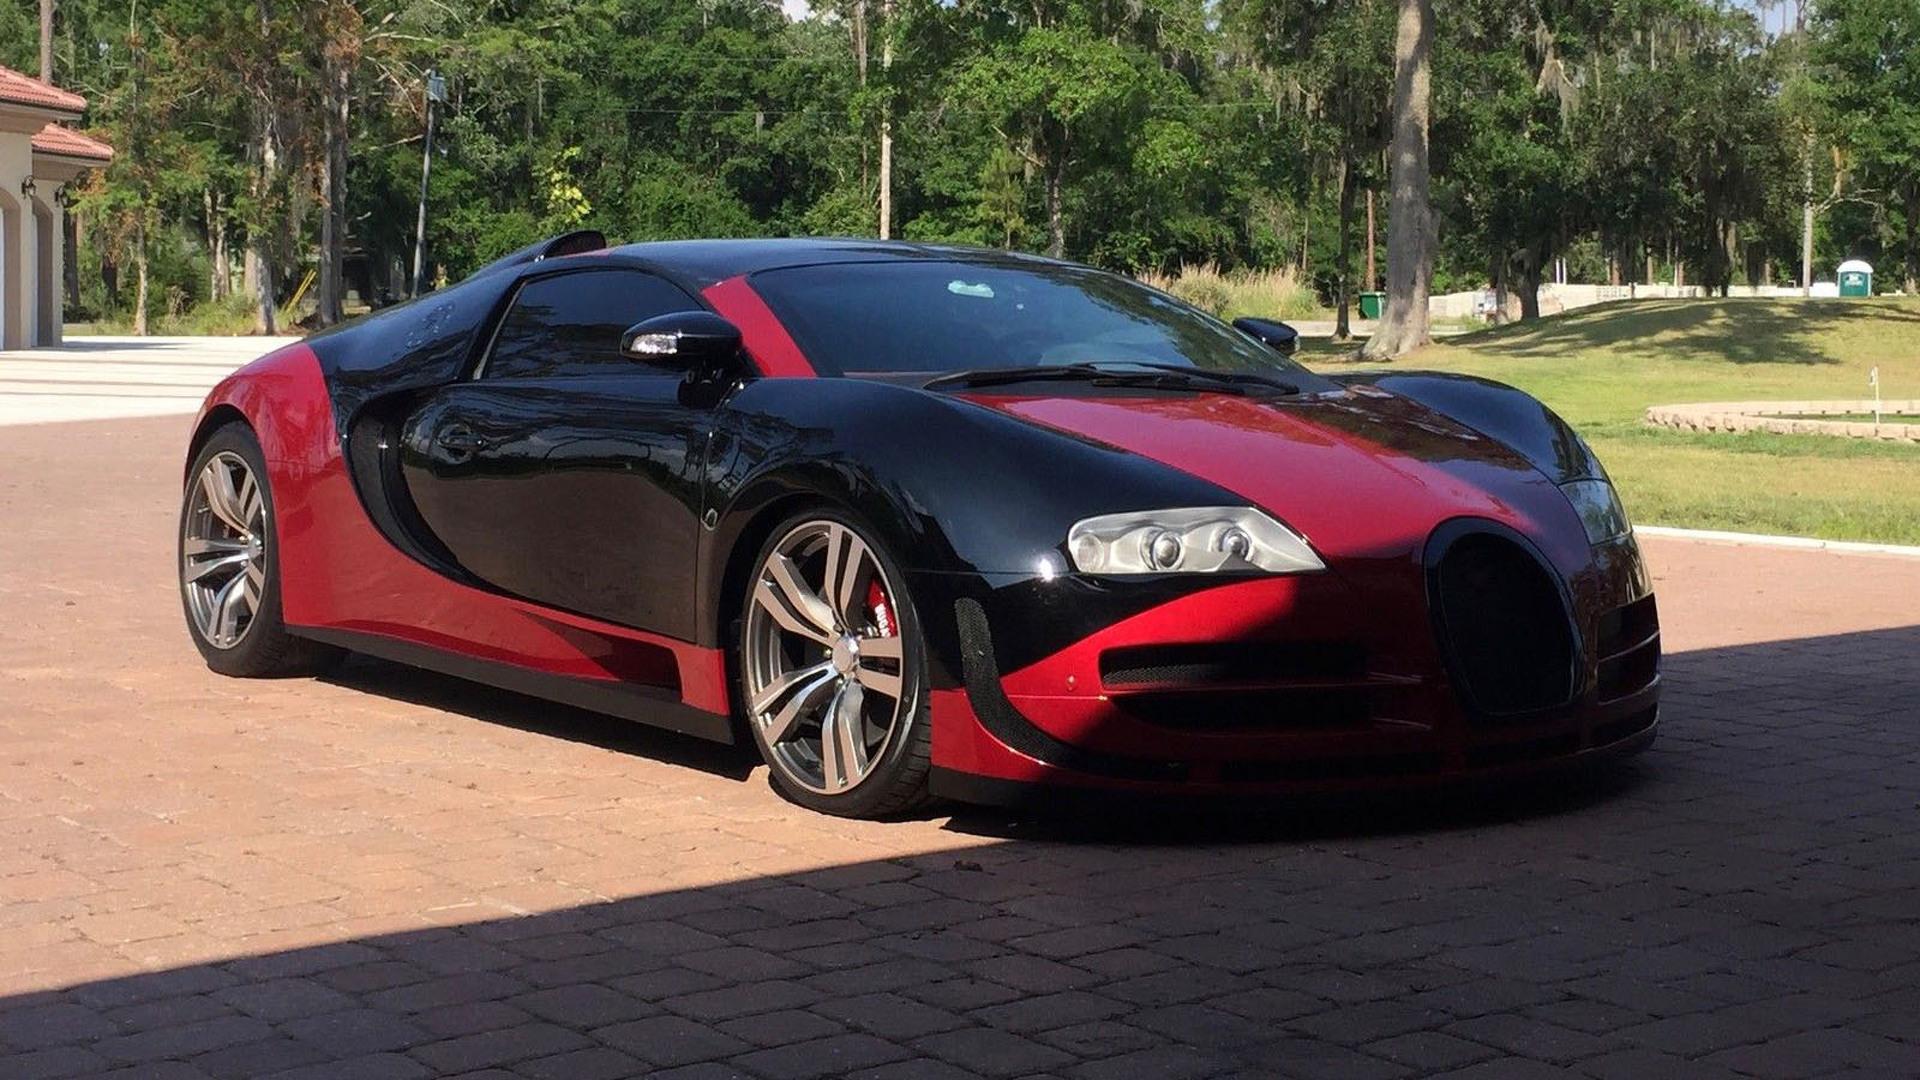 Buy a pontiac gto disguised as a bugatti veyron for 125k